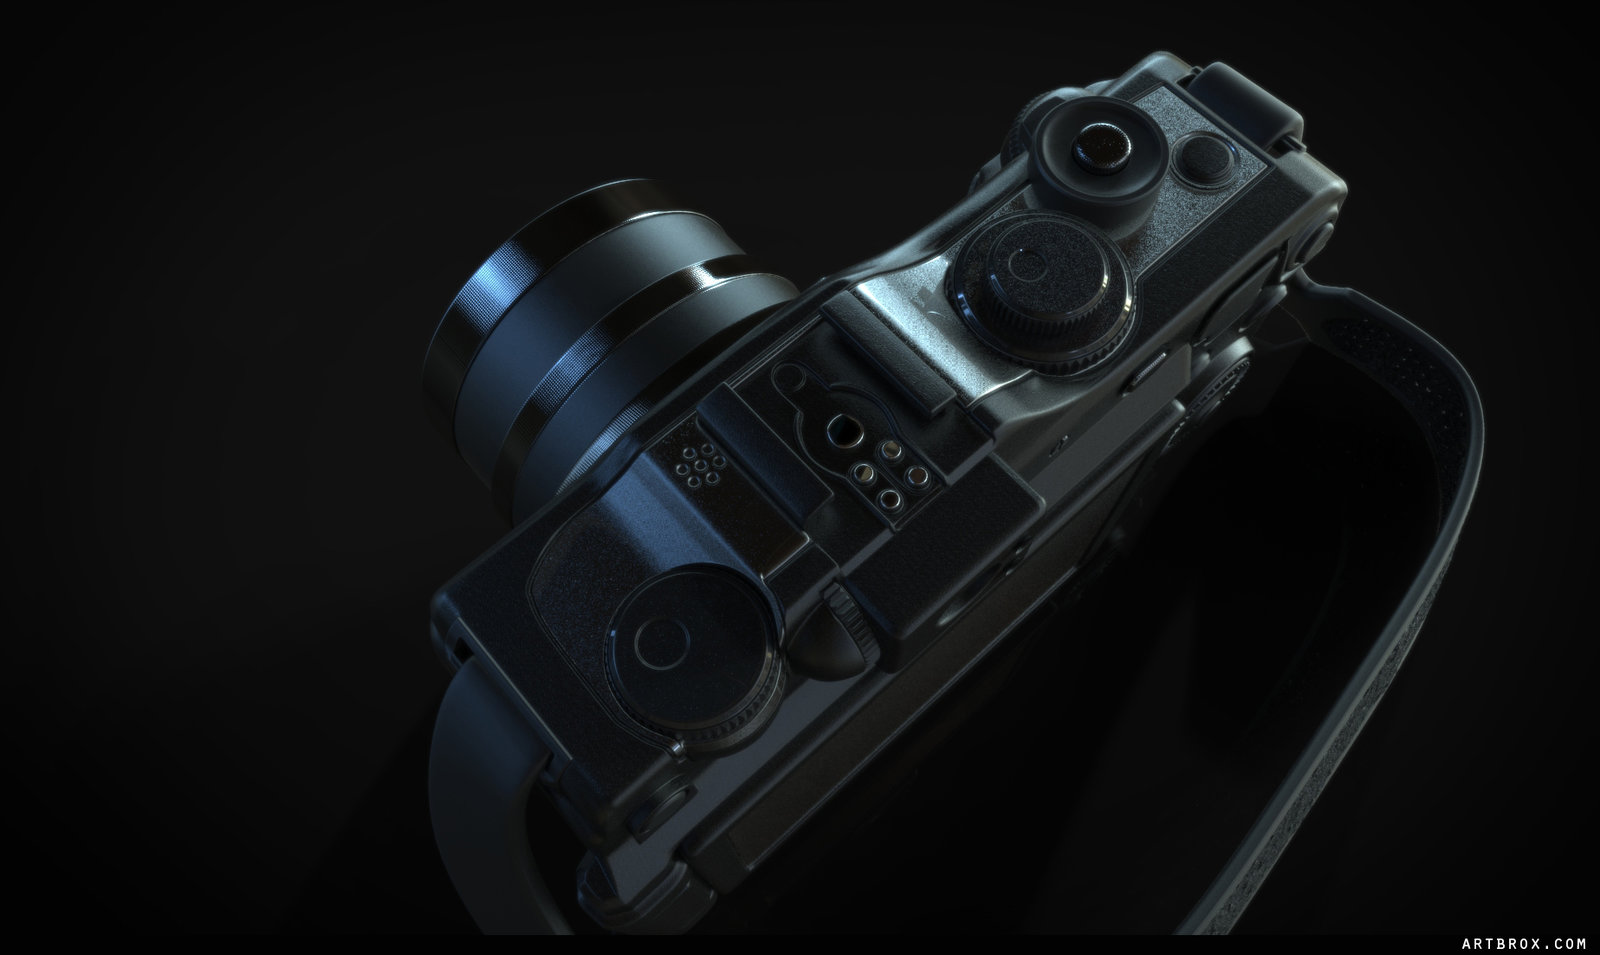 Camera highpoly